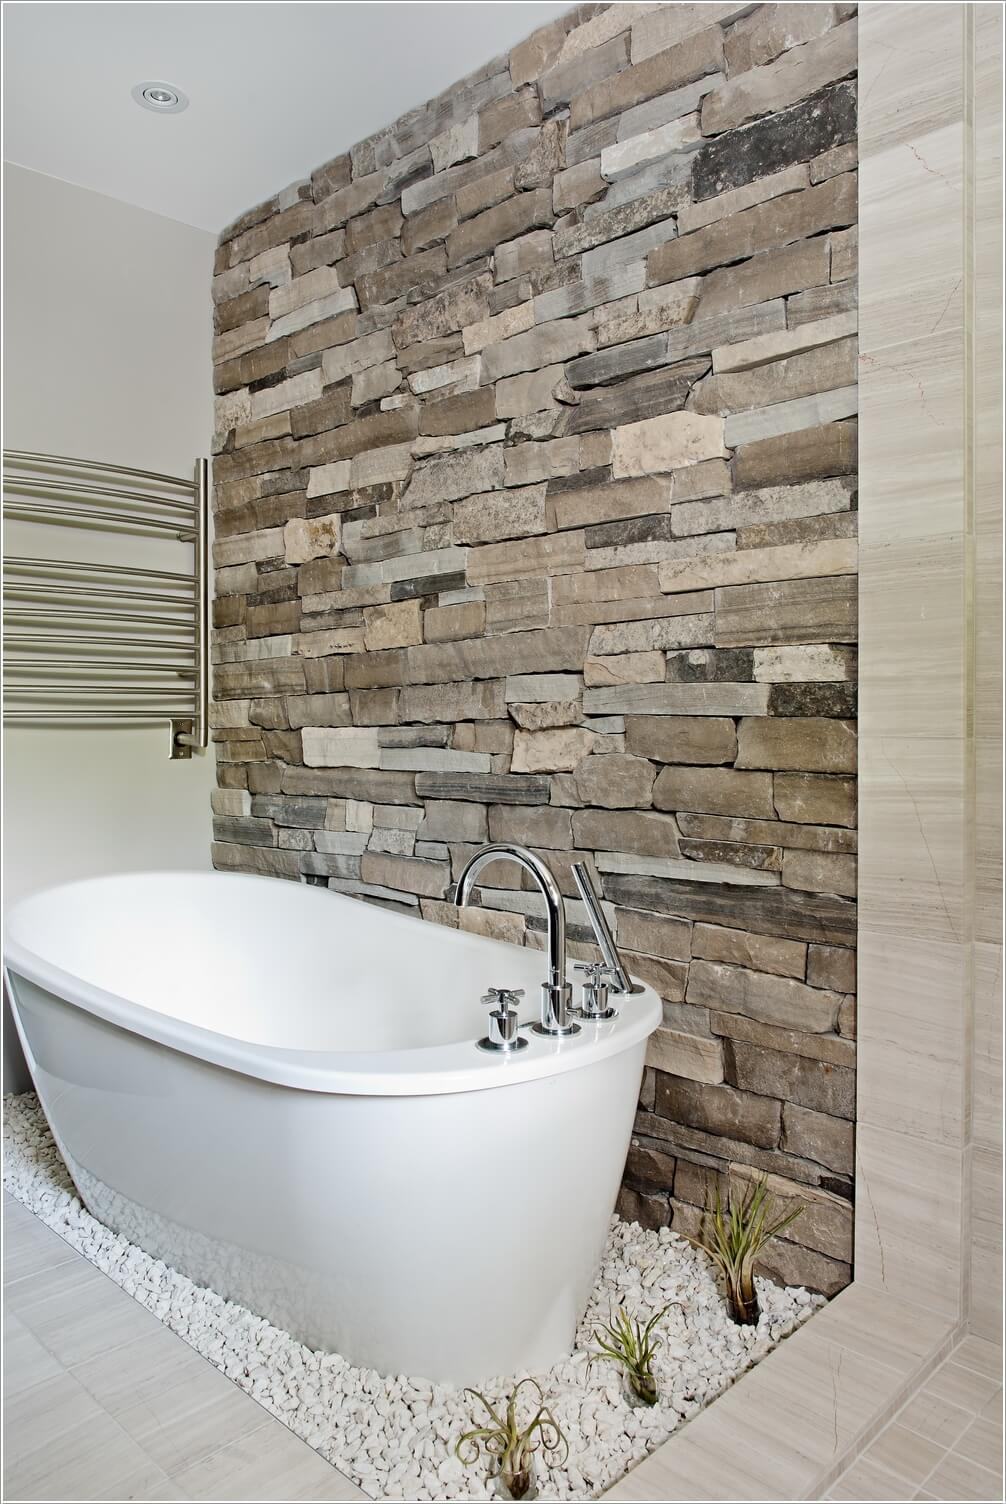 Most Inspiring Airstone Accent Wall Bathroom - 13-amazing-accent-wall-ideas-for-your-bathroom-12  Collection_978743.jpg